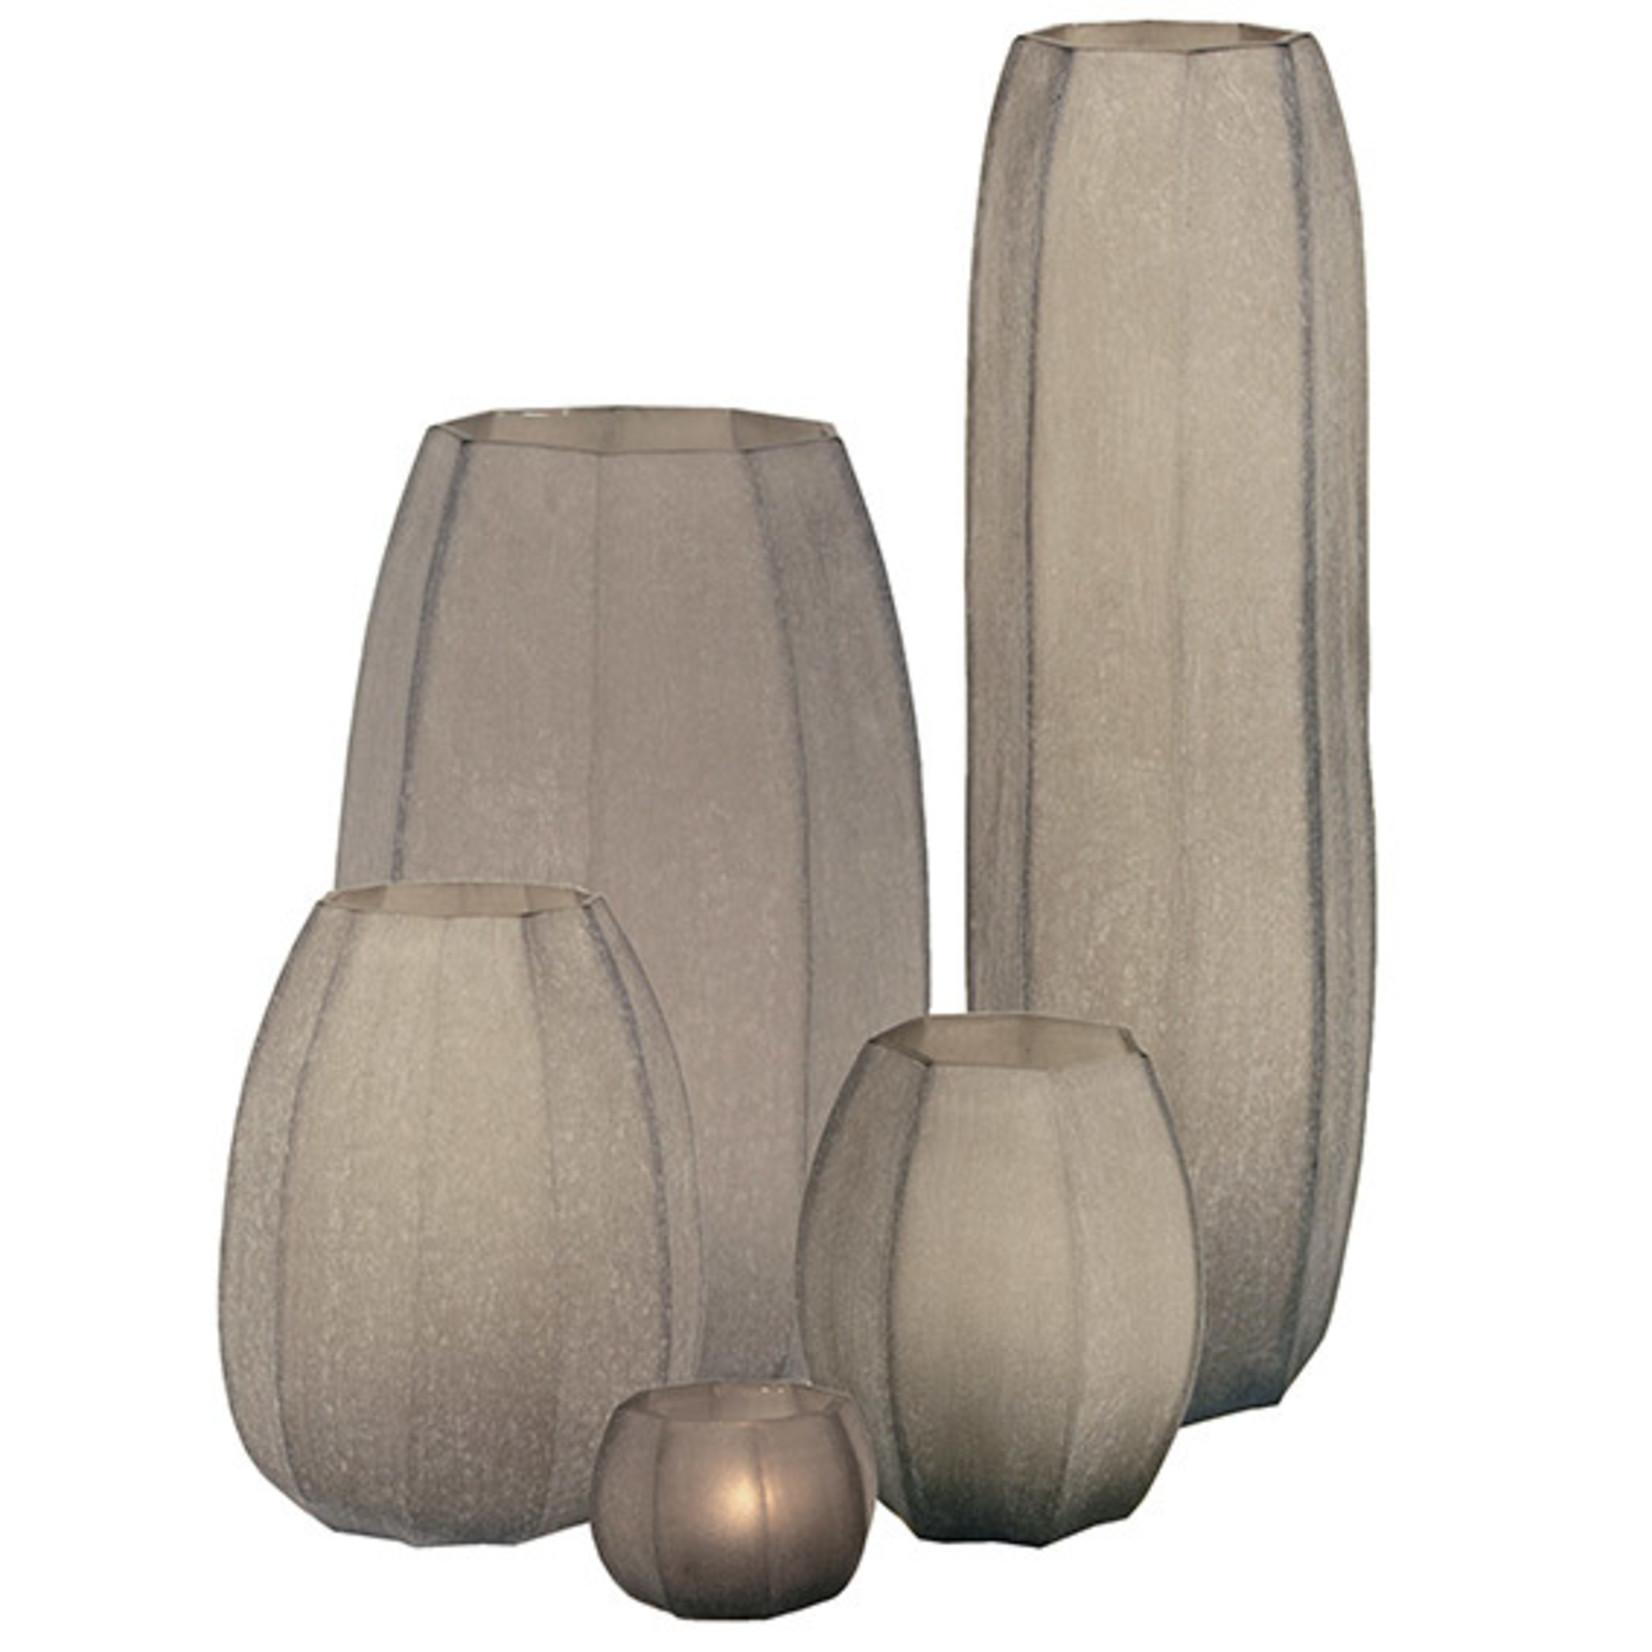 Guaxs Vase Koonam S | smoke grey